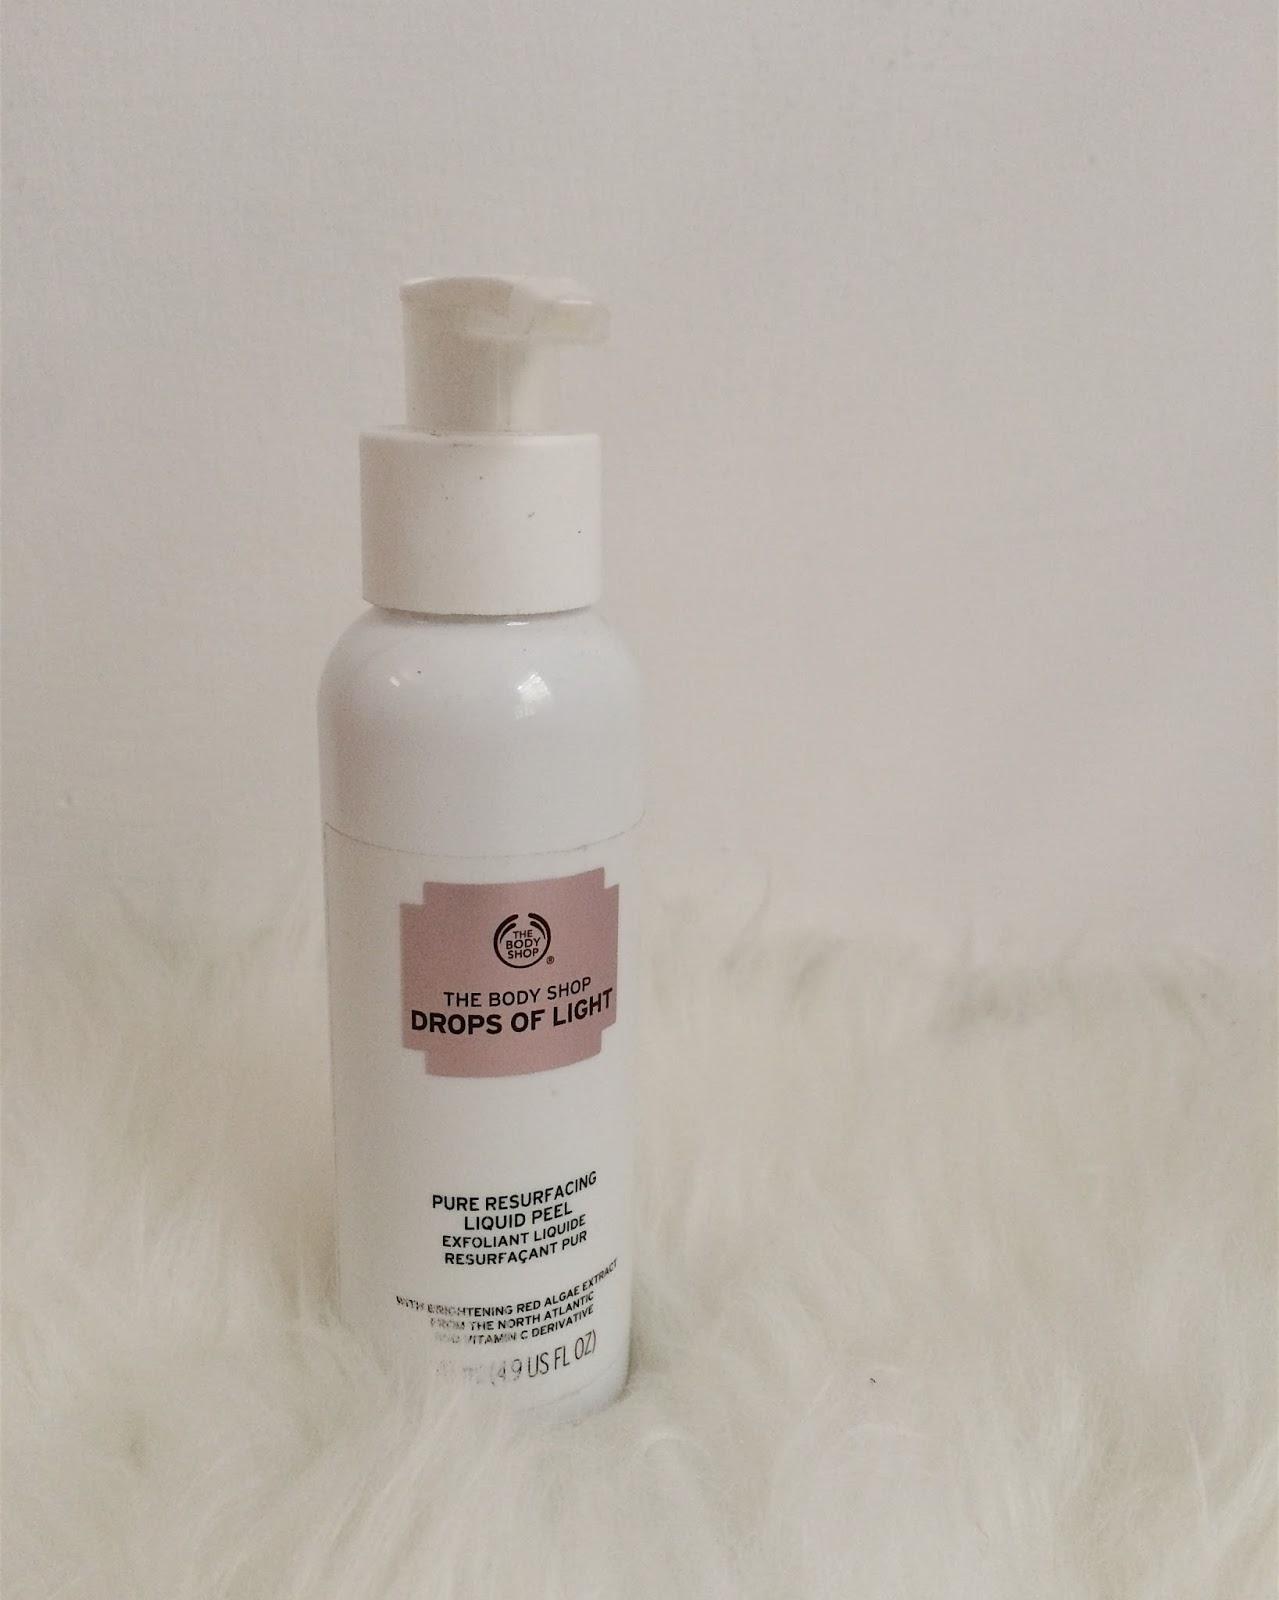 Review The Body Shop Drops Of Light Pure Resurfacing Liquid Peel Herstory Journal